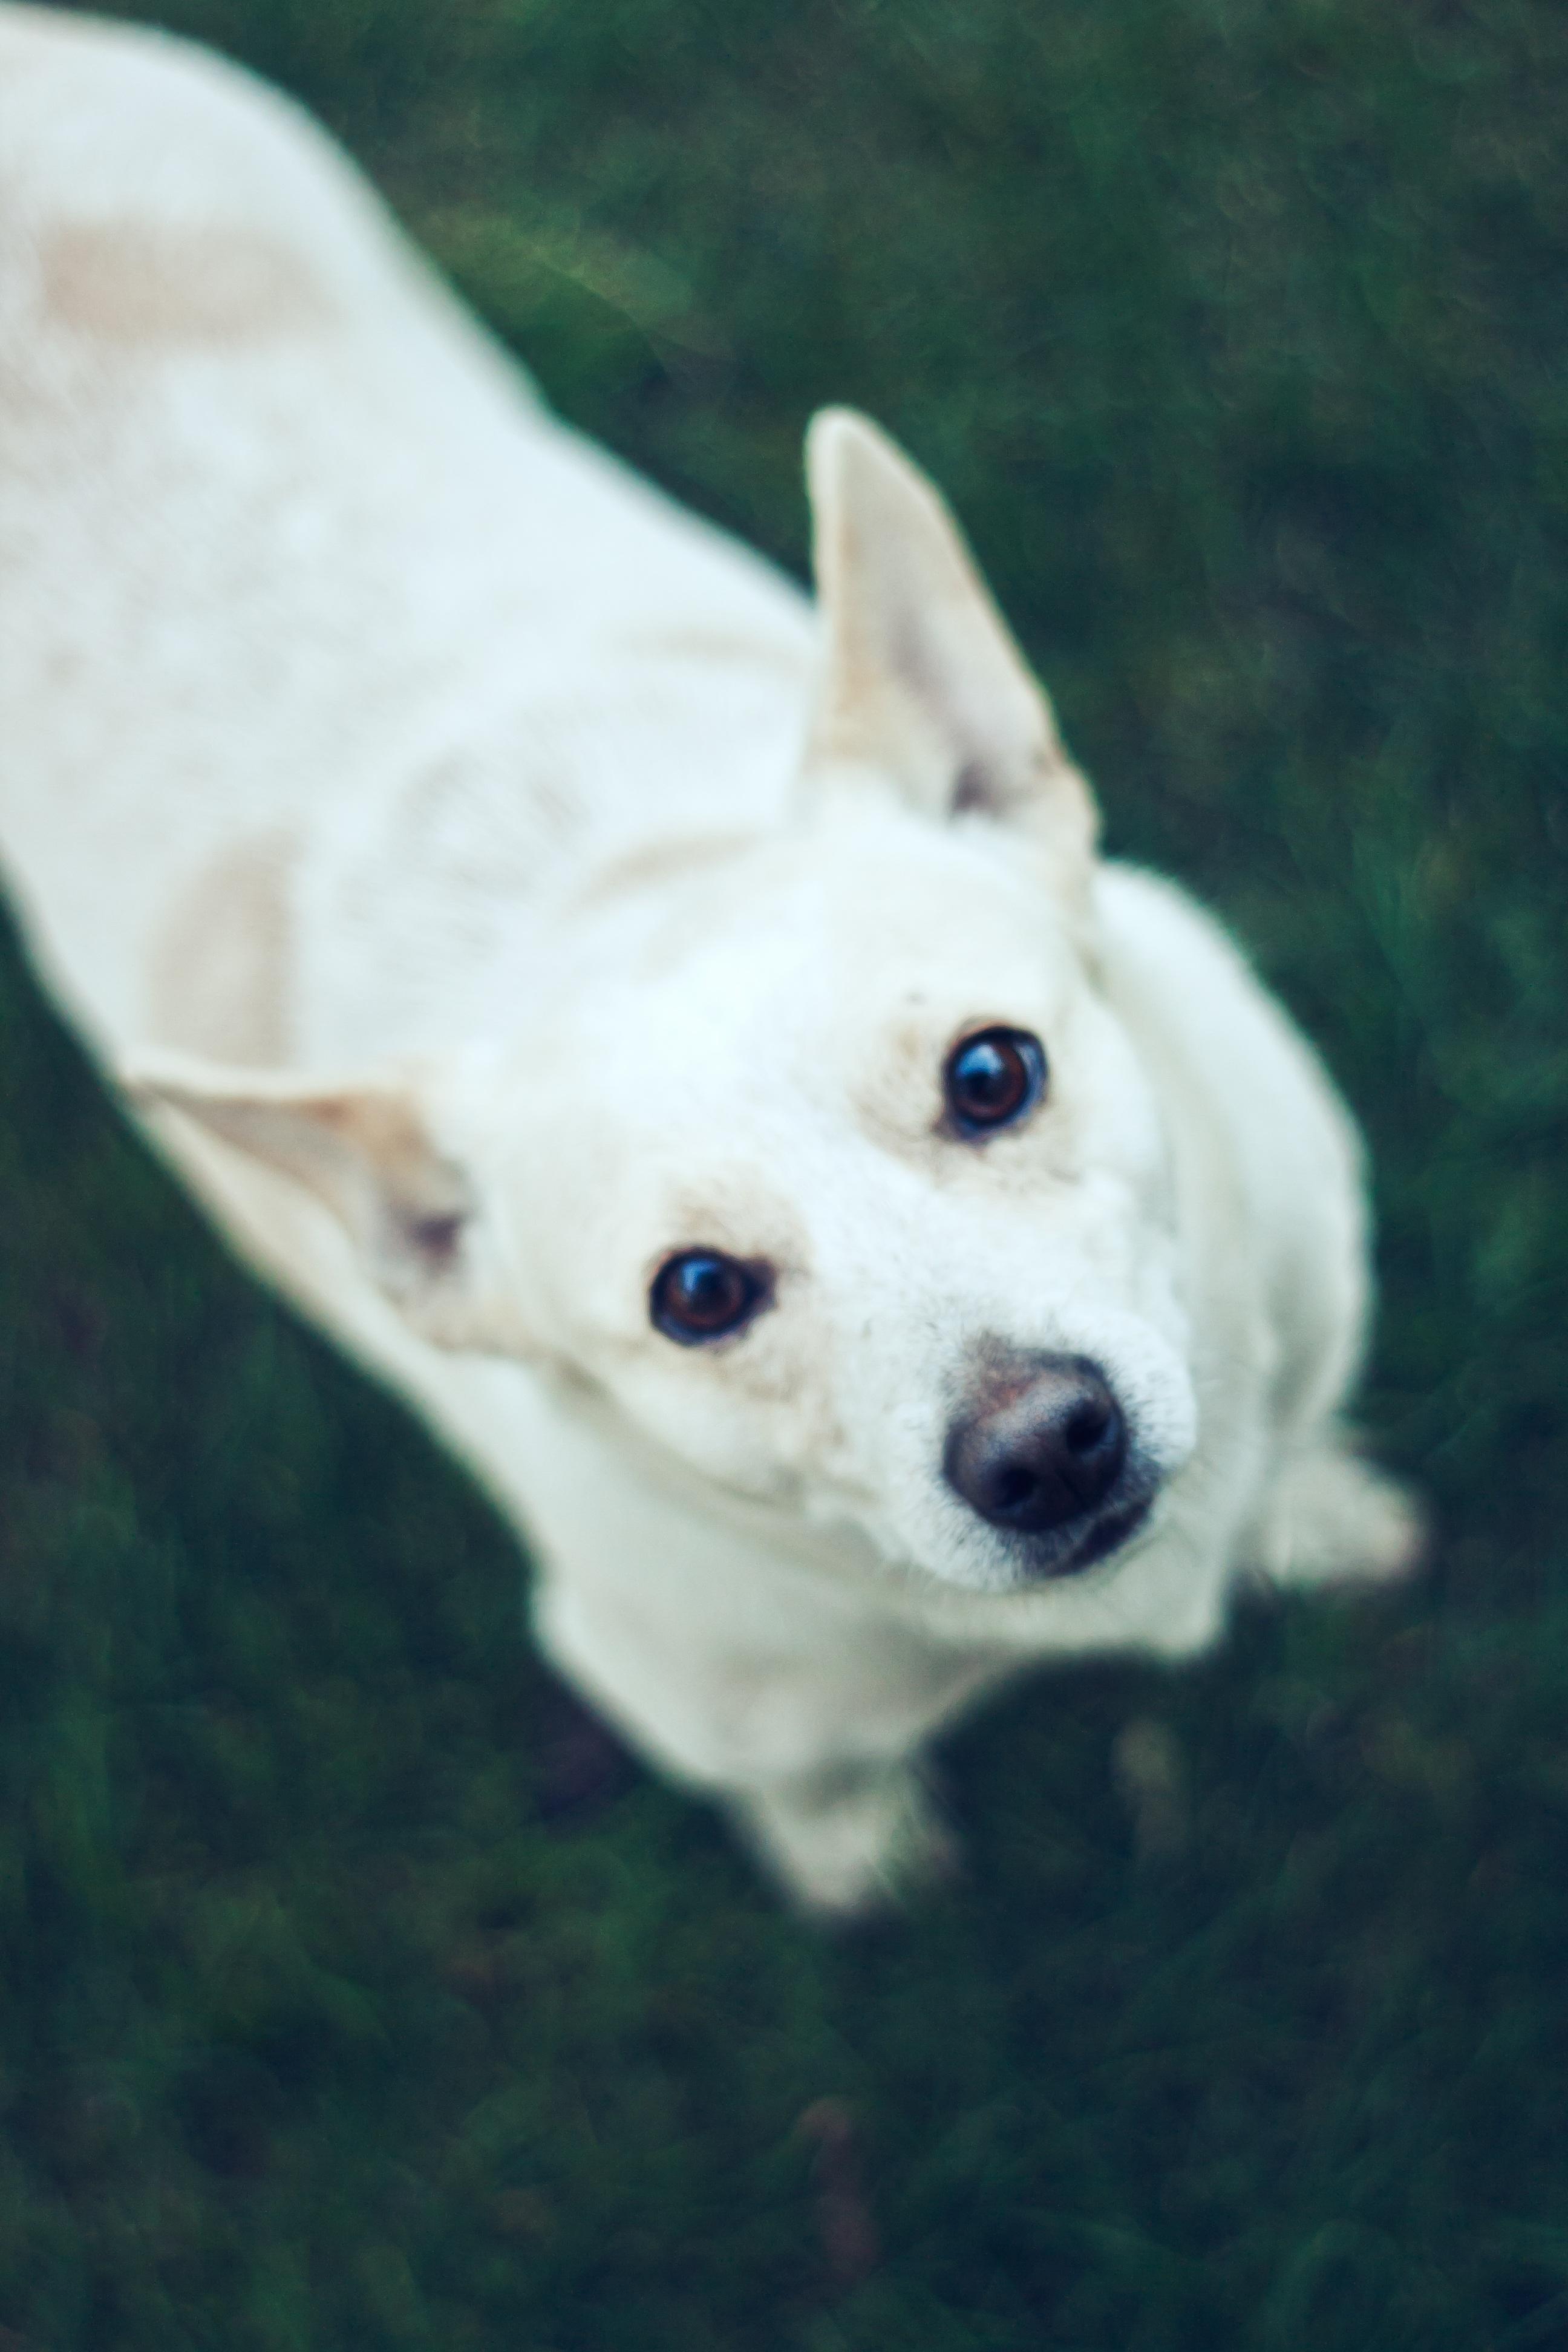 Free white puppy animal cute pet small vertebrate